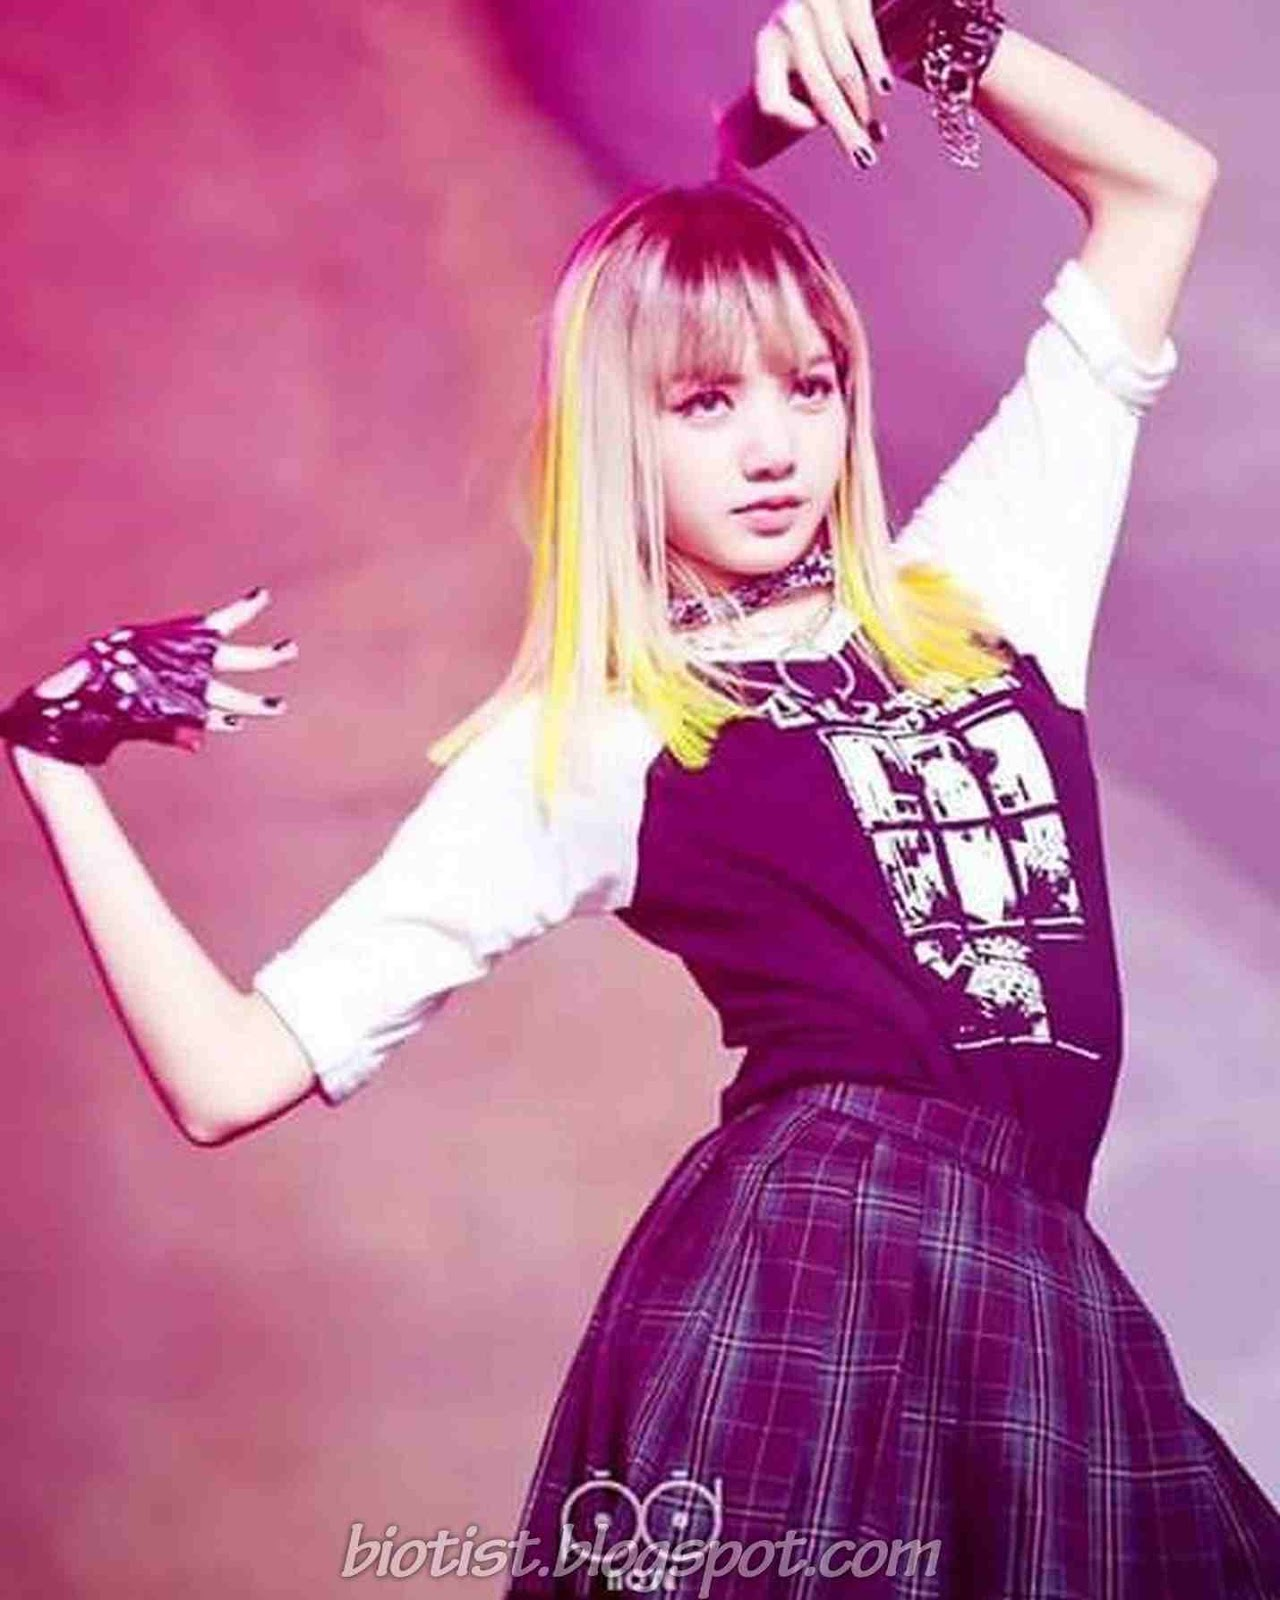 Blackpink Wallpaper 2016: Lisa (BlackPink) Profile, Photos, Fact, Bio And More